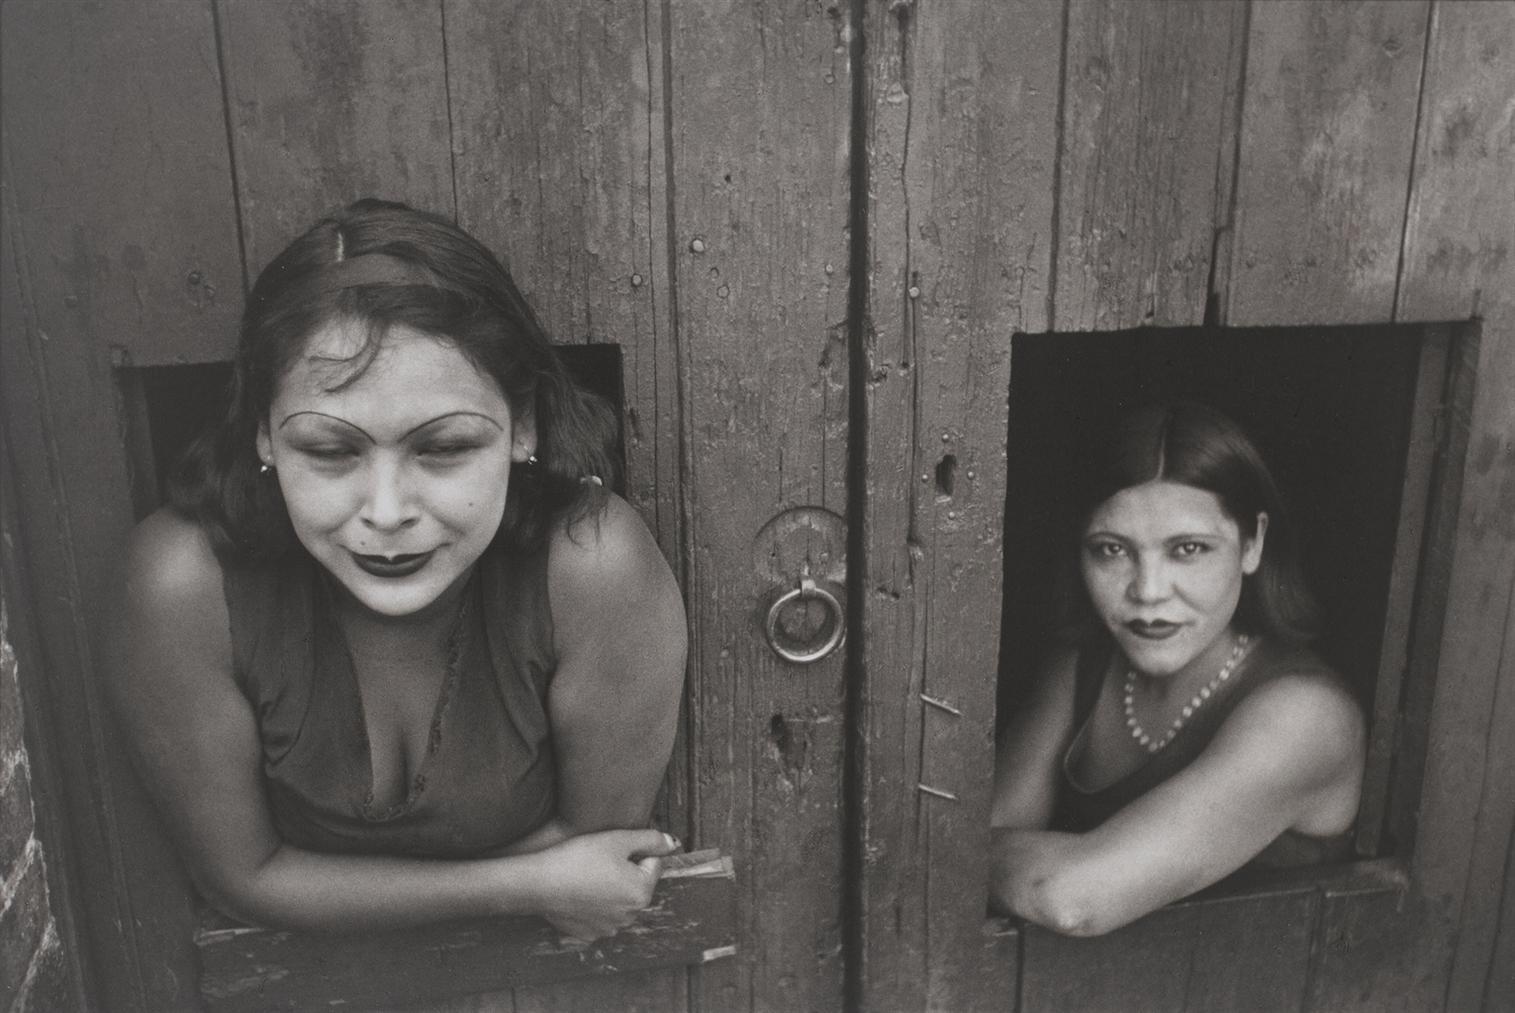 Henri Cartier-Bresson-Calle Cuauhtemoctzin, Mexico City, 1934-1935-